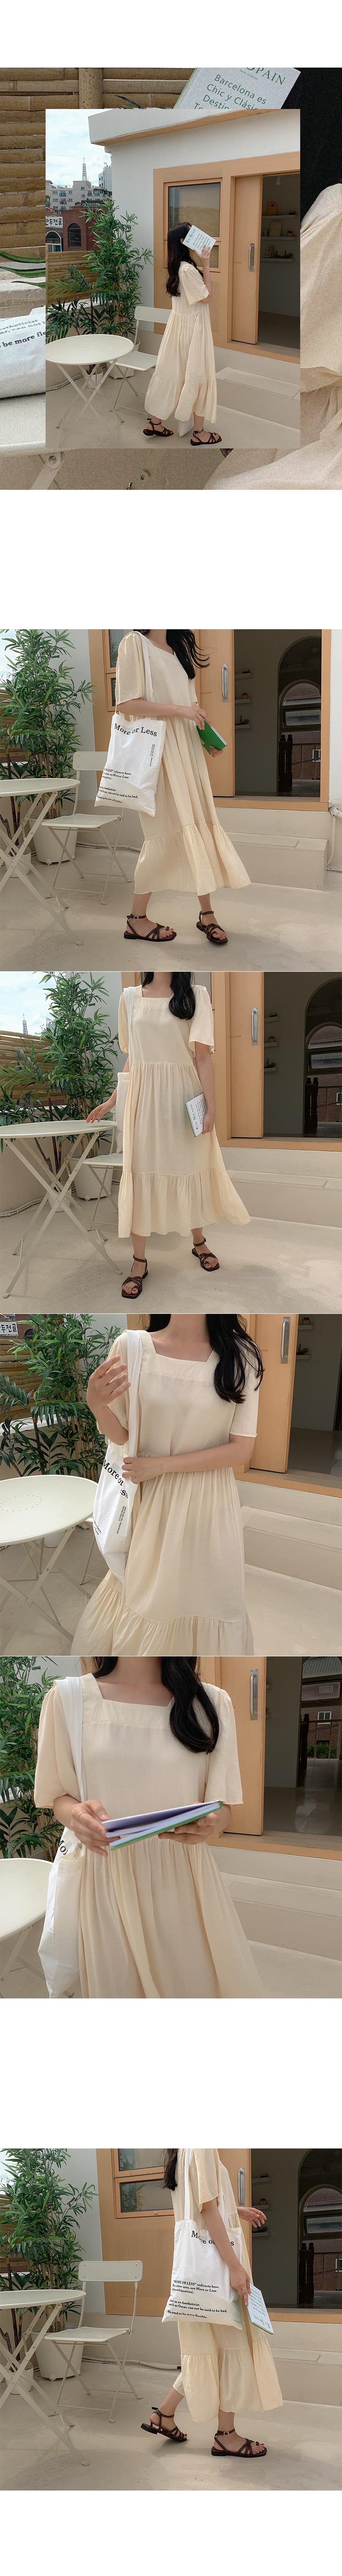 Aldi Square Dress